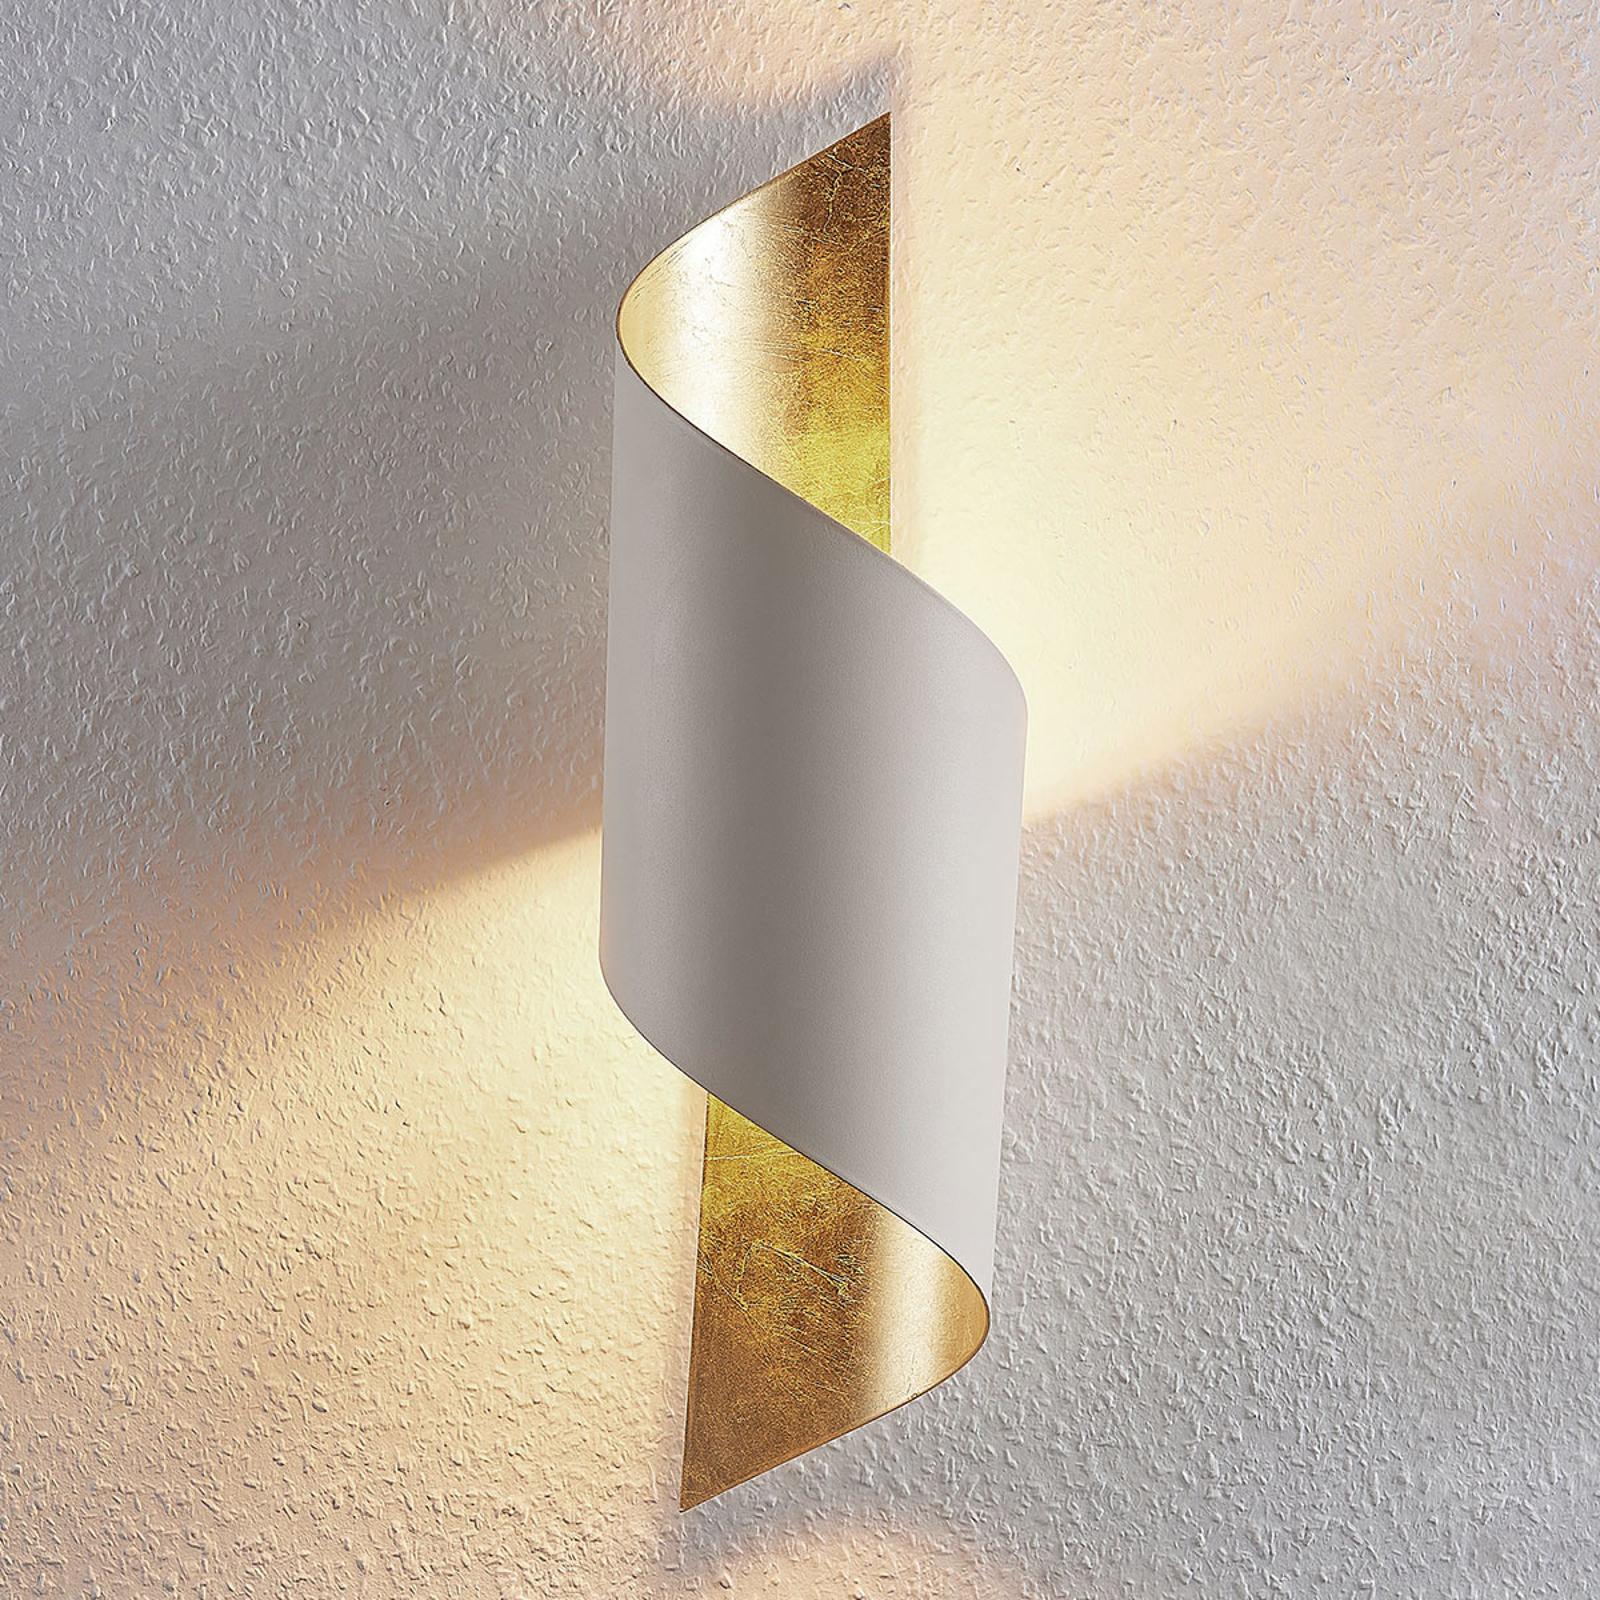 Metallvägglampa Vanni, inrullad, vit-guld